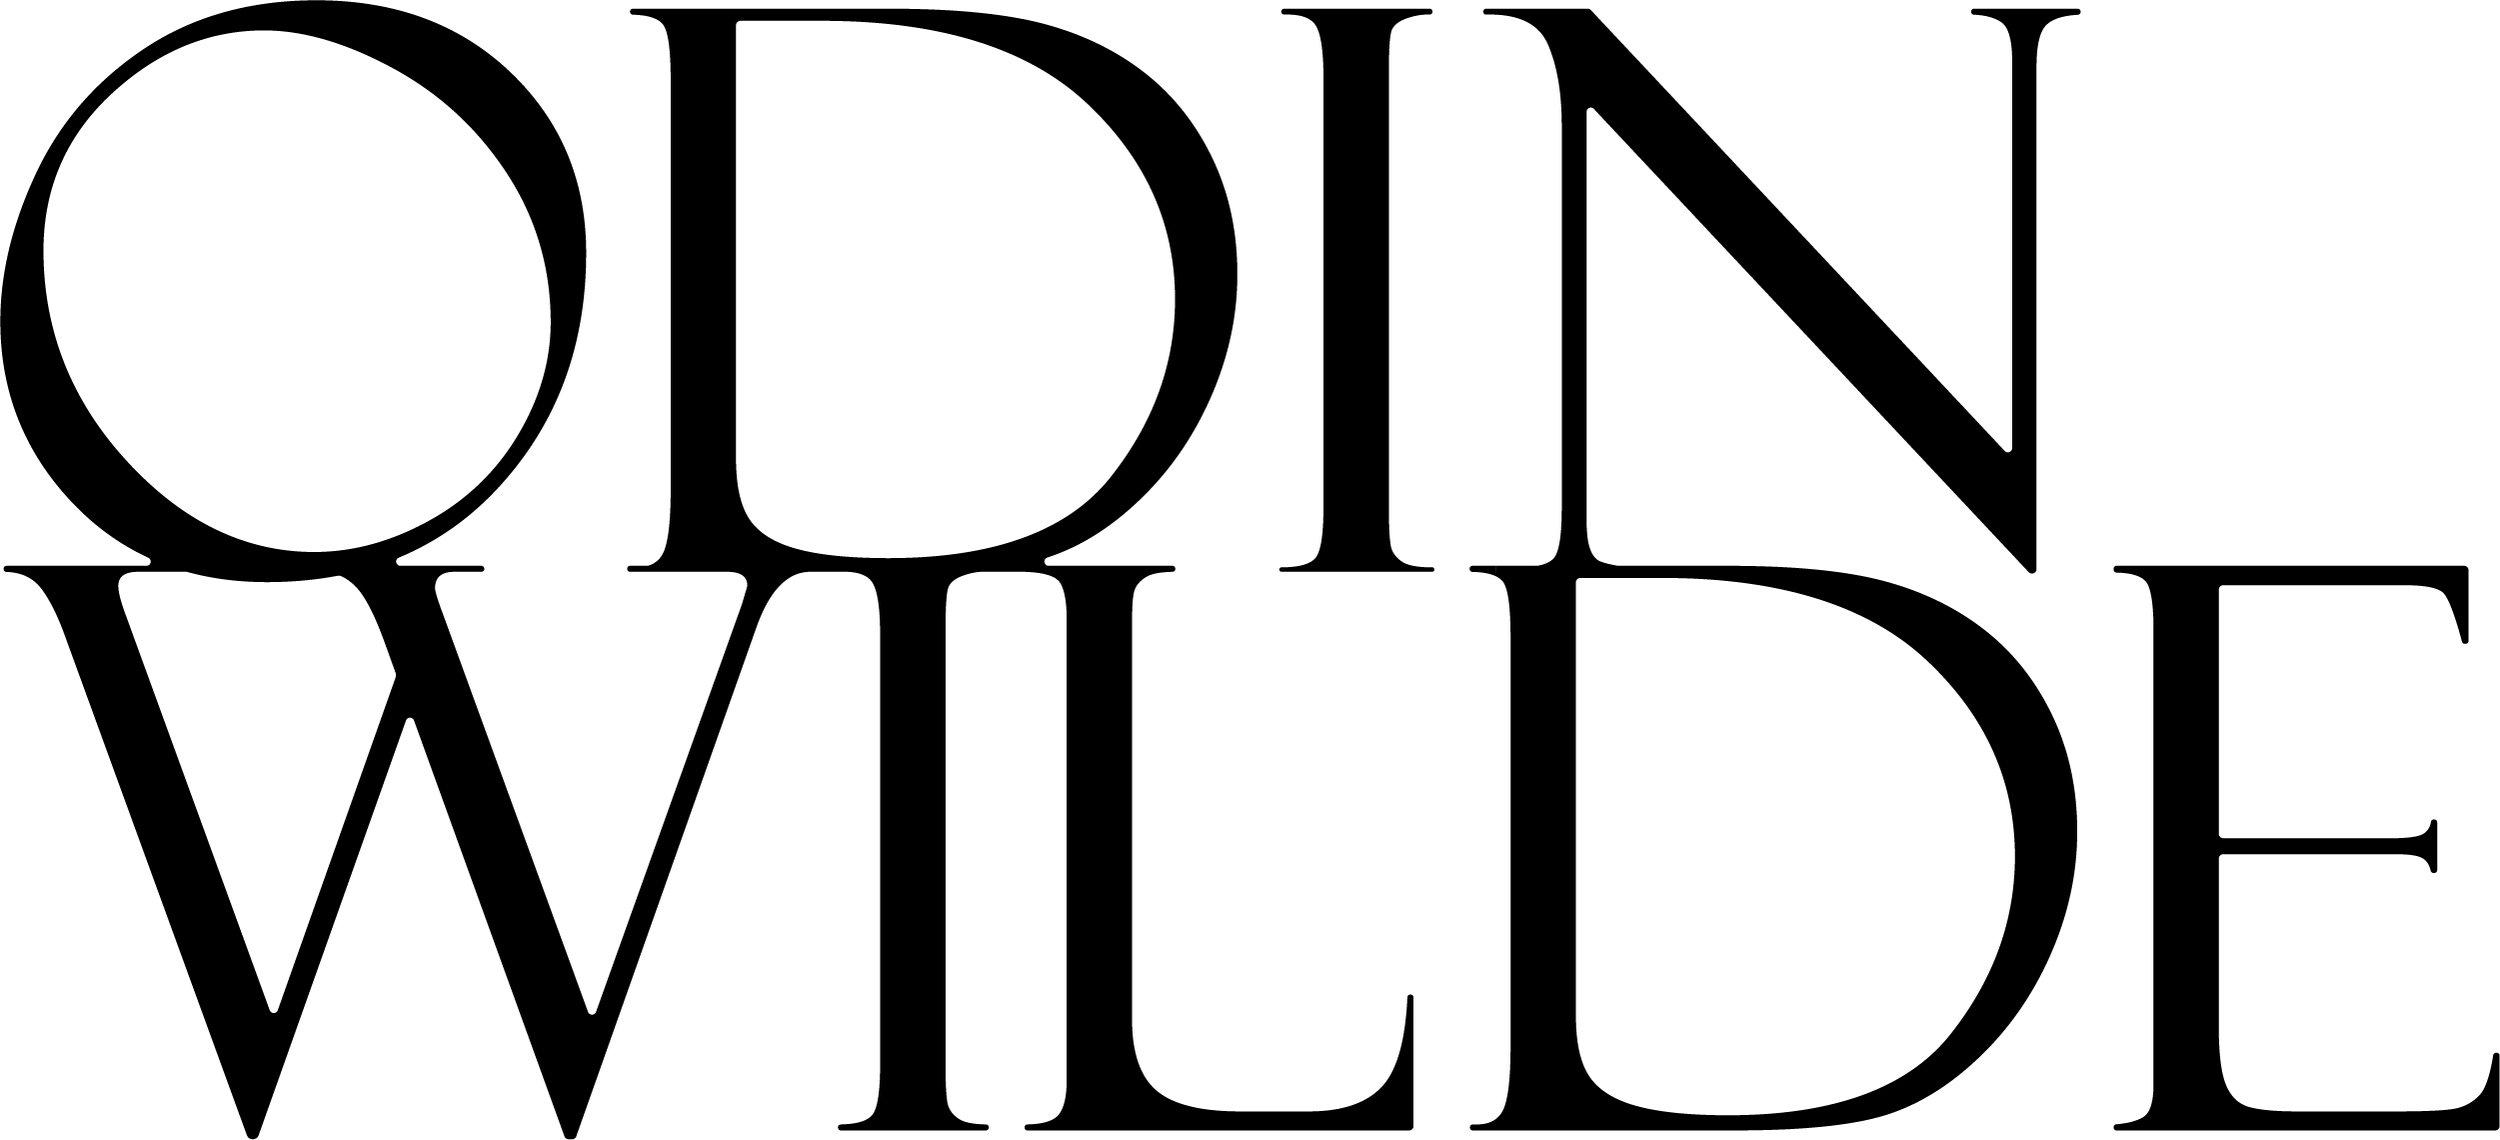 Branding_Odin Wilde Black.jpg